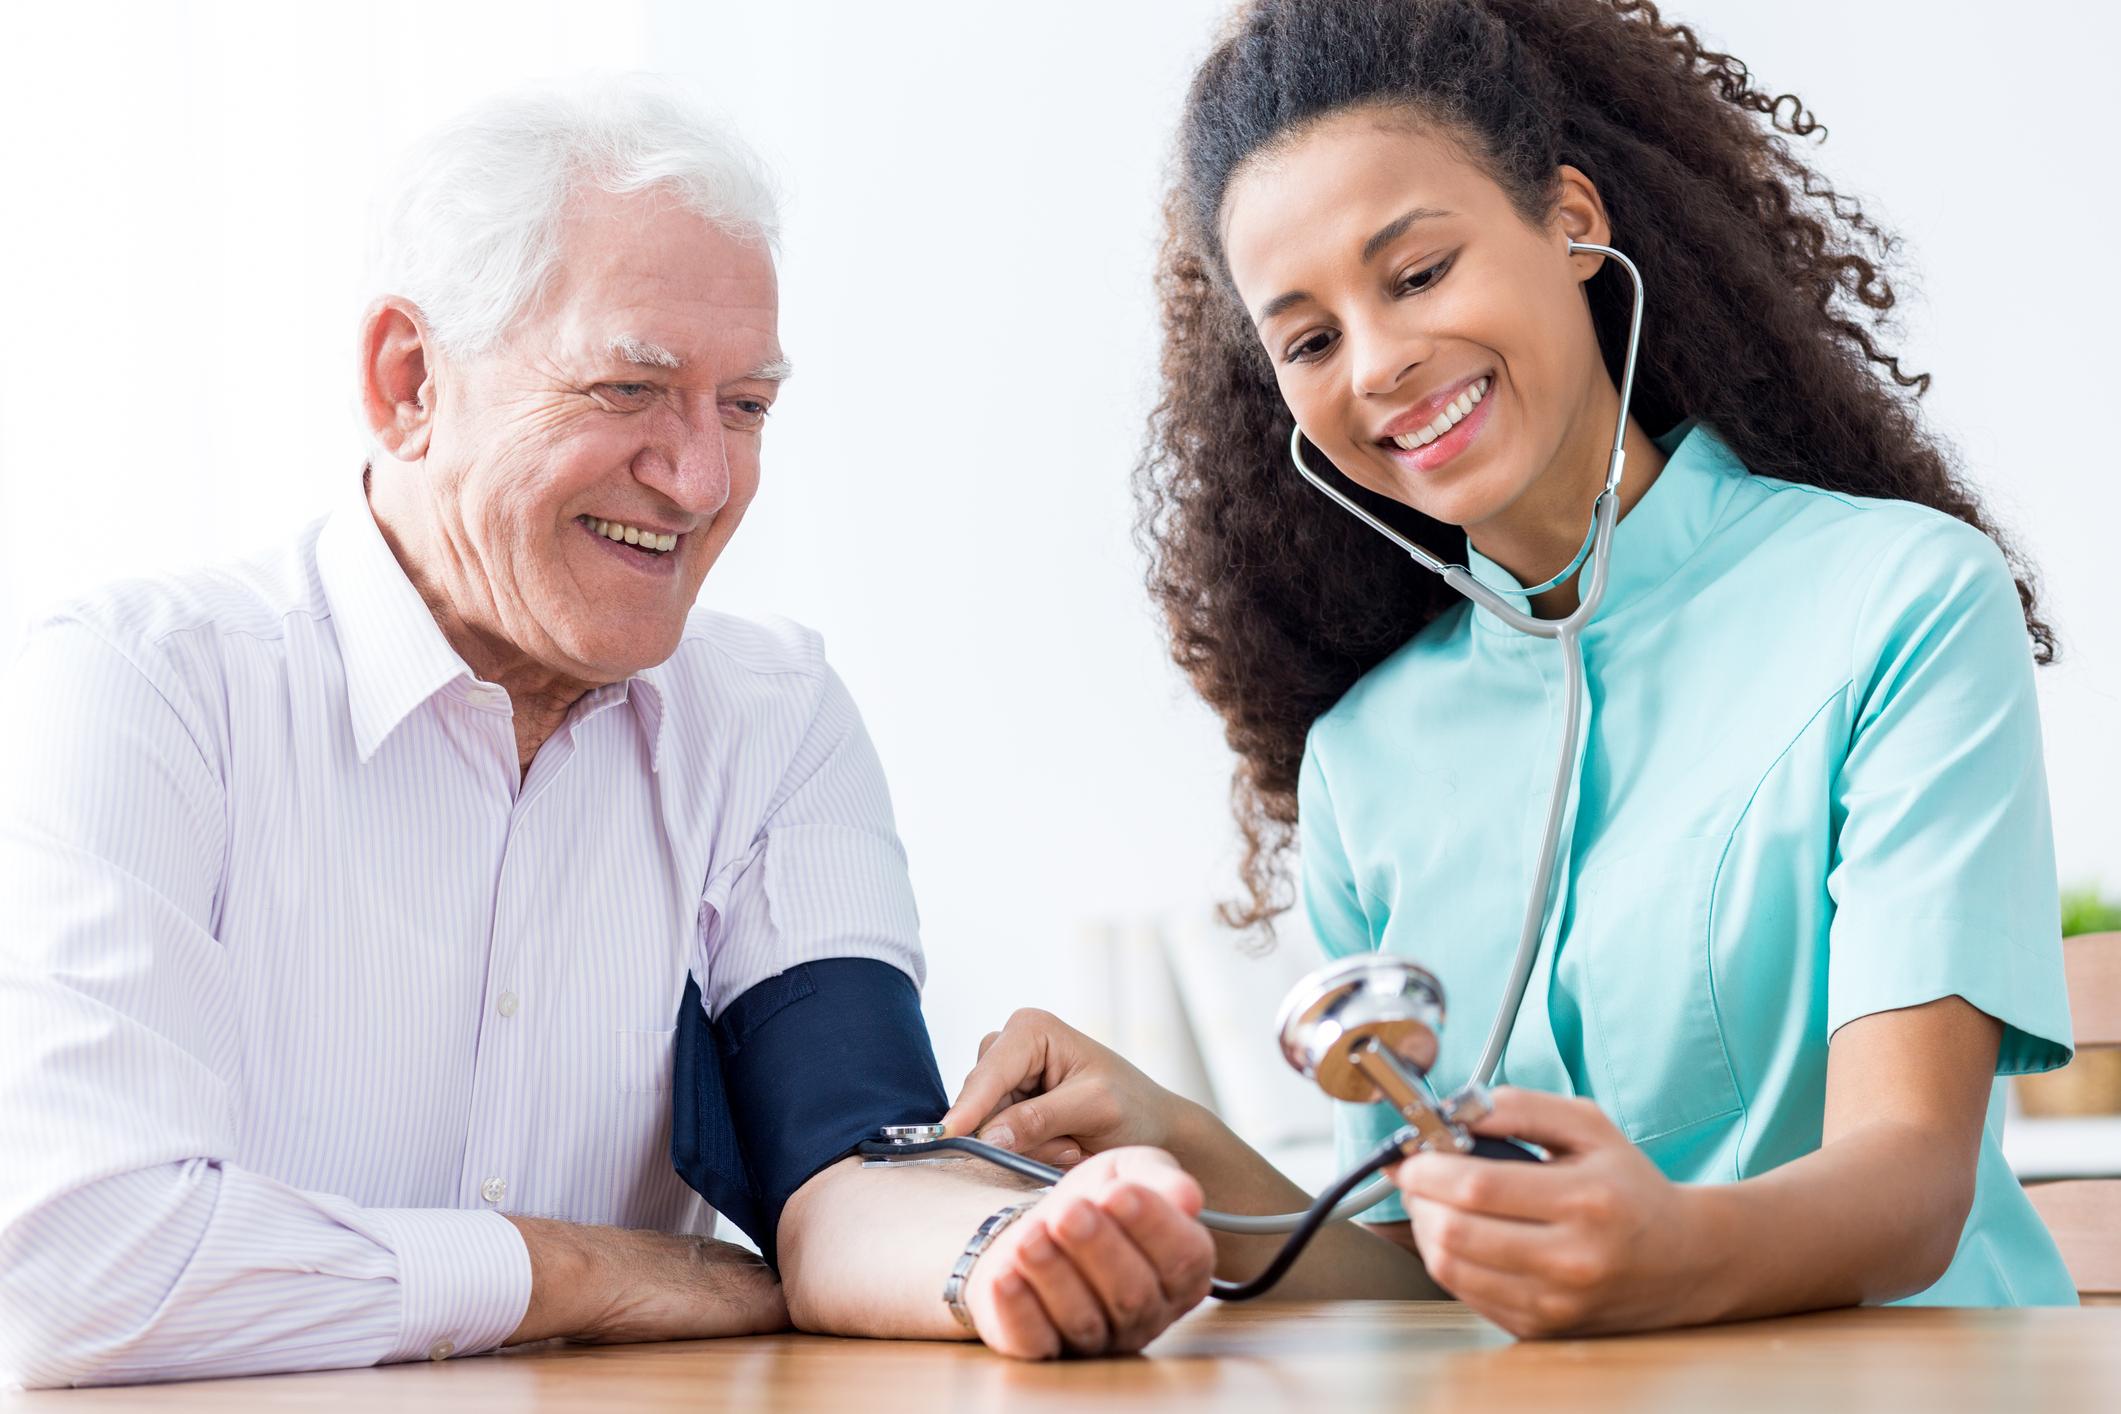 Woman in scrubs taking a senior citizen's blood pressure.